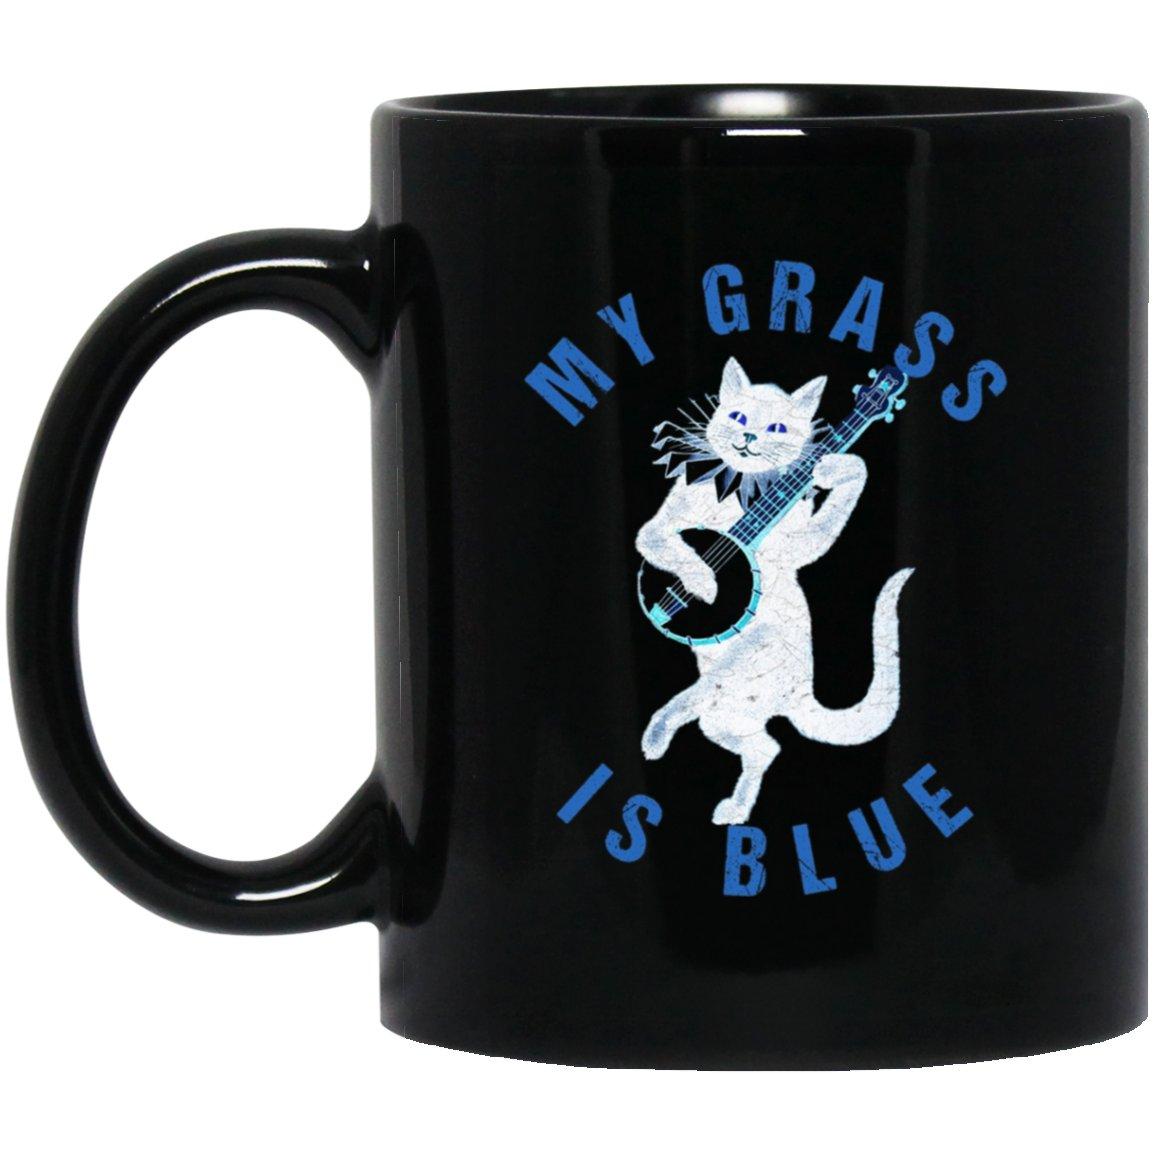 My Grass is Blue Banjo Ca-Bluegrass Fan Black  Mug Black Ceramic 11oz Coffee Tea Cup